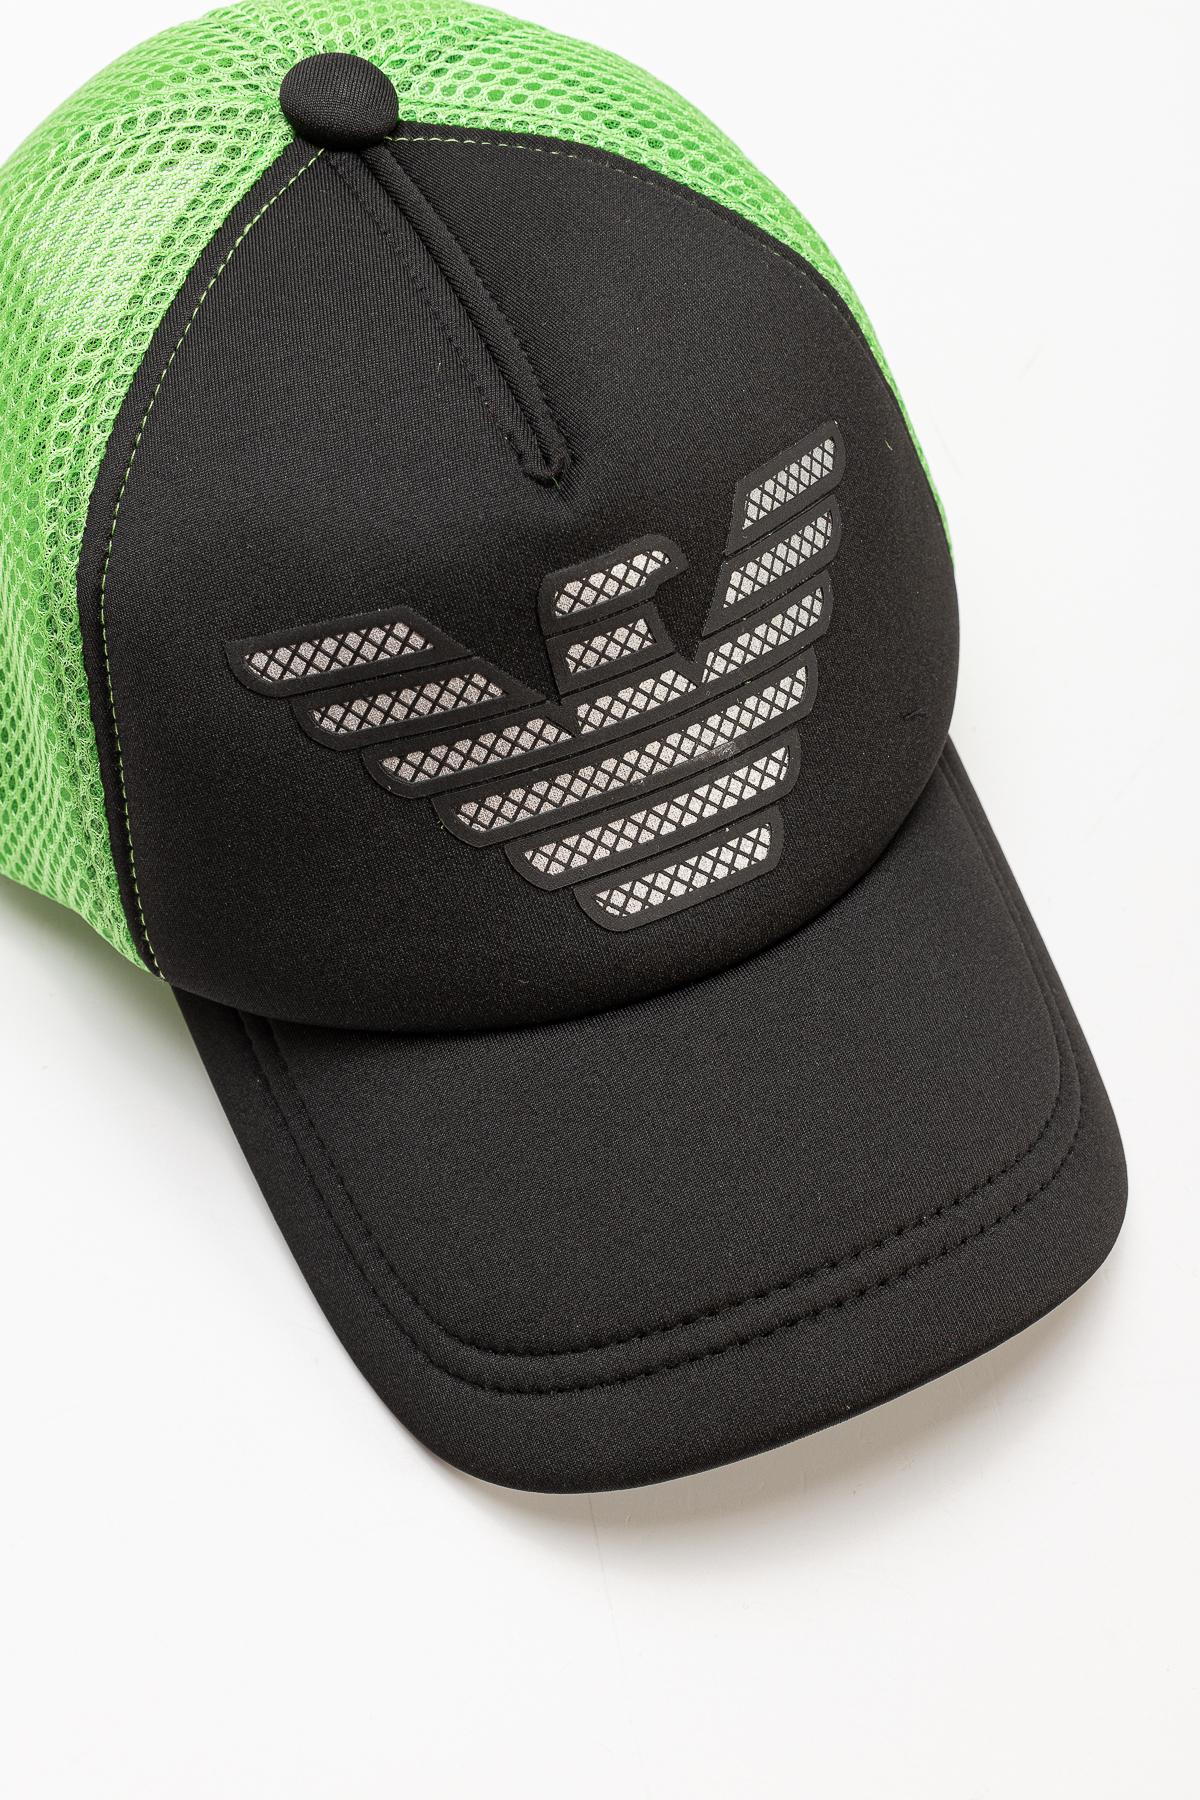 Emporio Armani Erkek Şapka